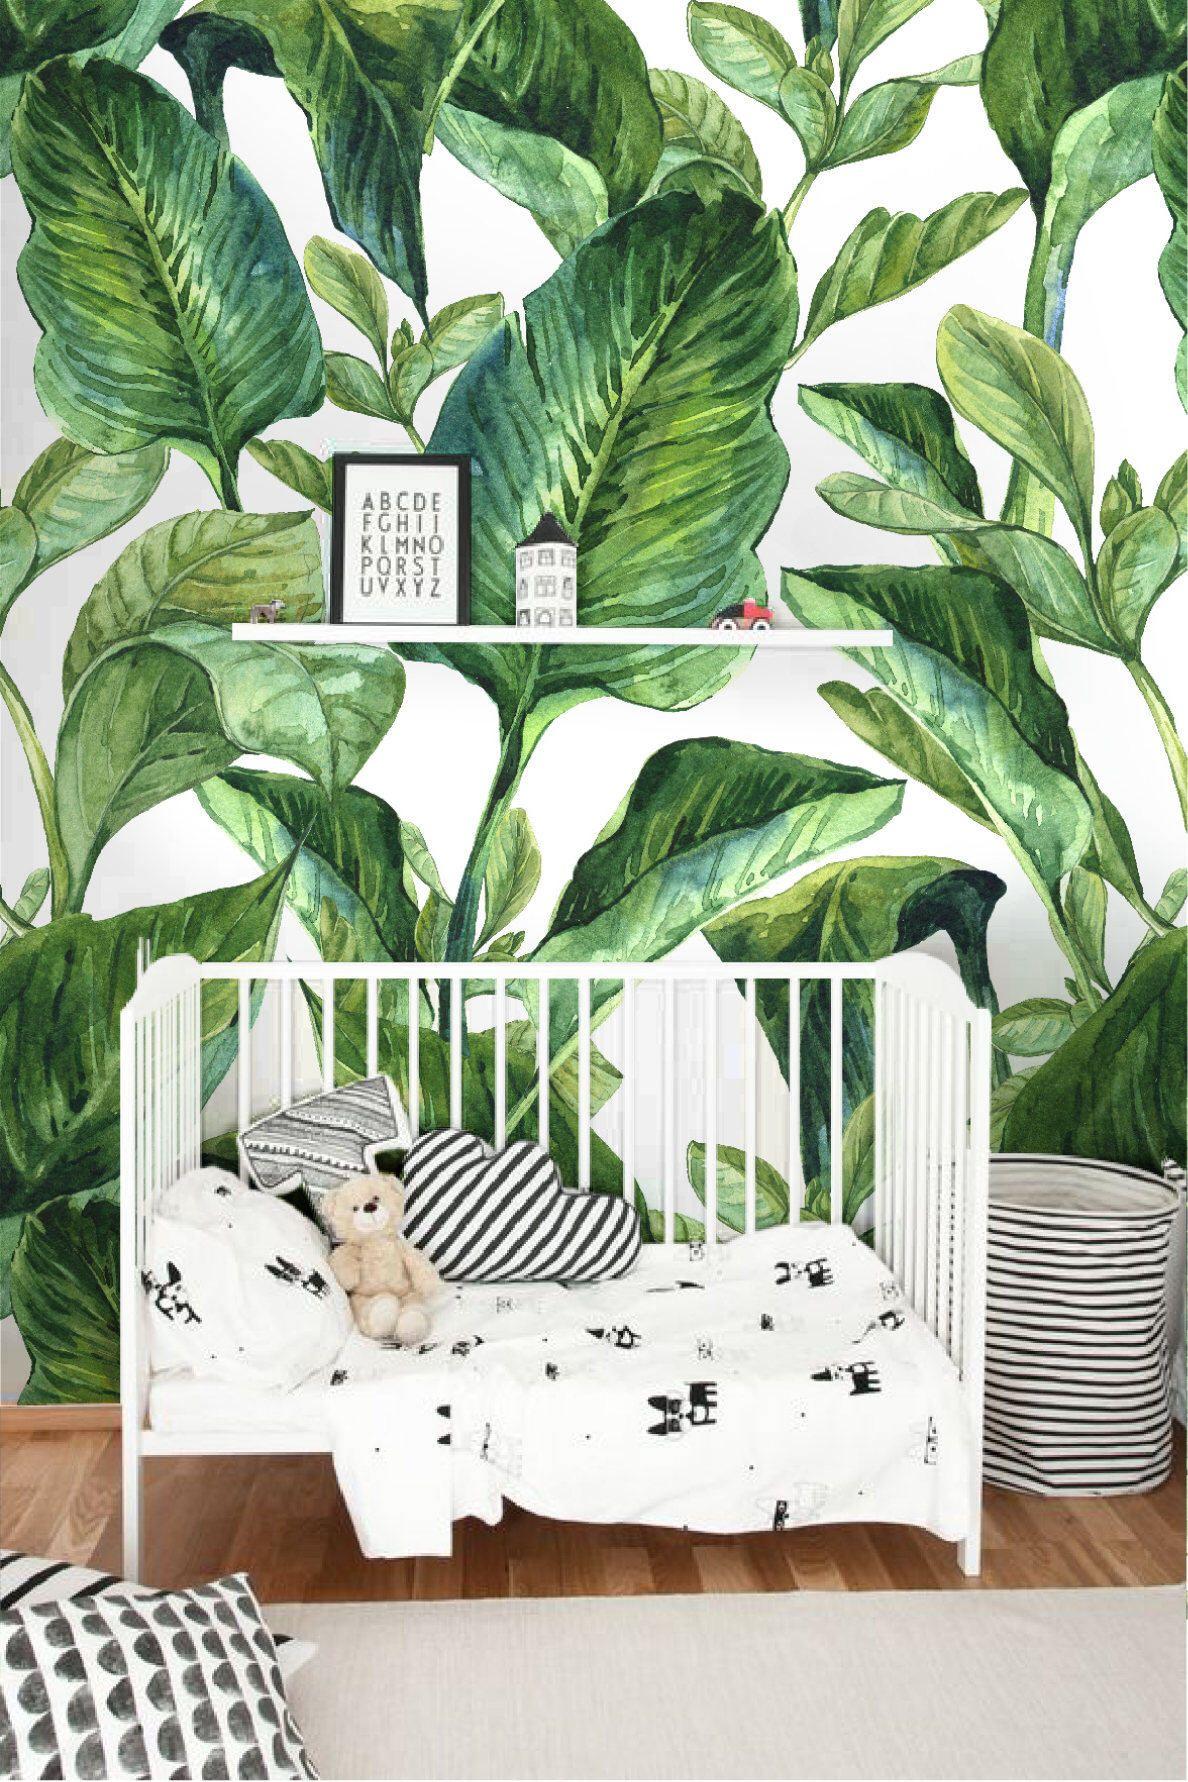 Removable Wallpaper With Banana Leaf Print Banana Leaves Peel Etsy Nursery Wallpaper Tropical Nursery Leaf Wallpaper